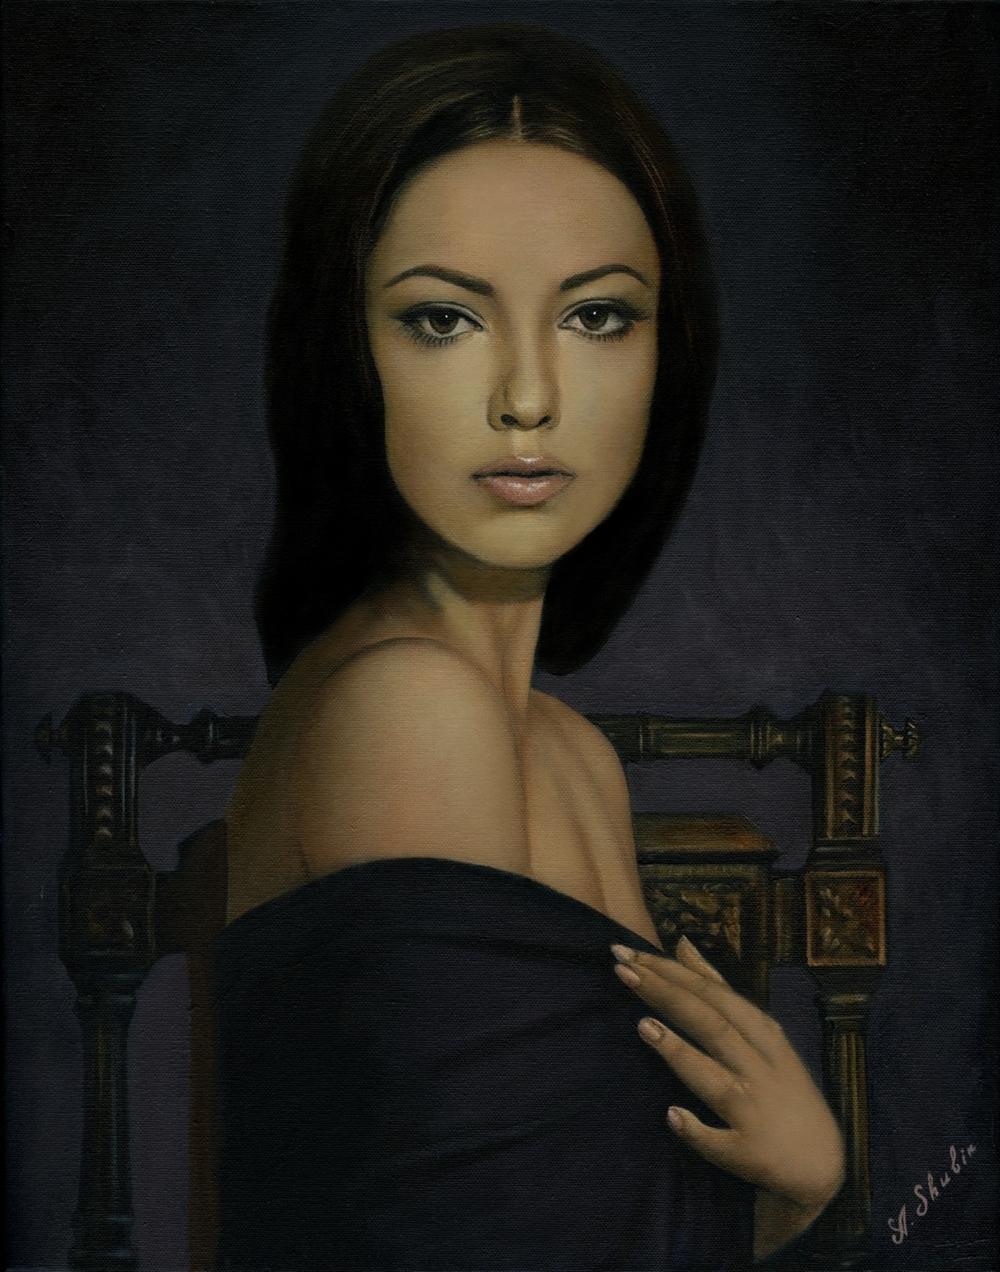 Oligar Modern Russian Woman Portrait 49